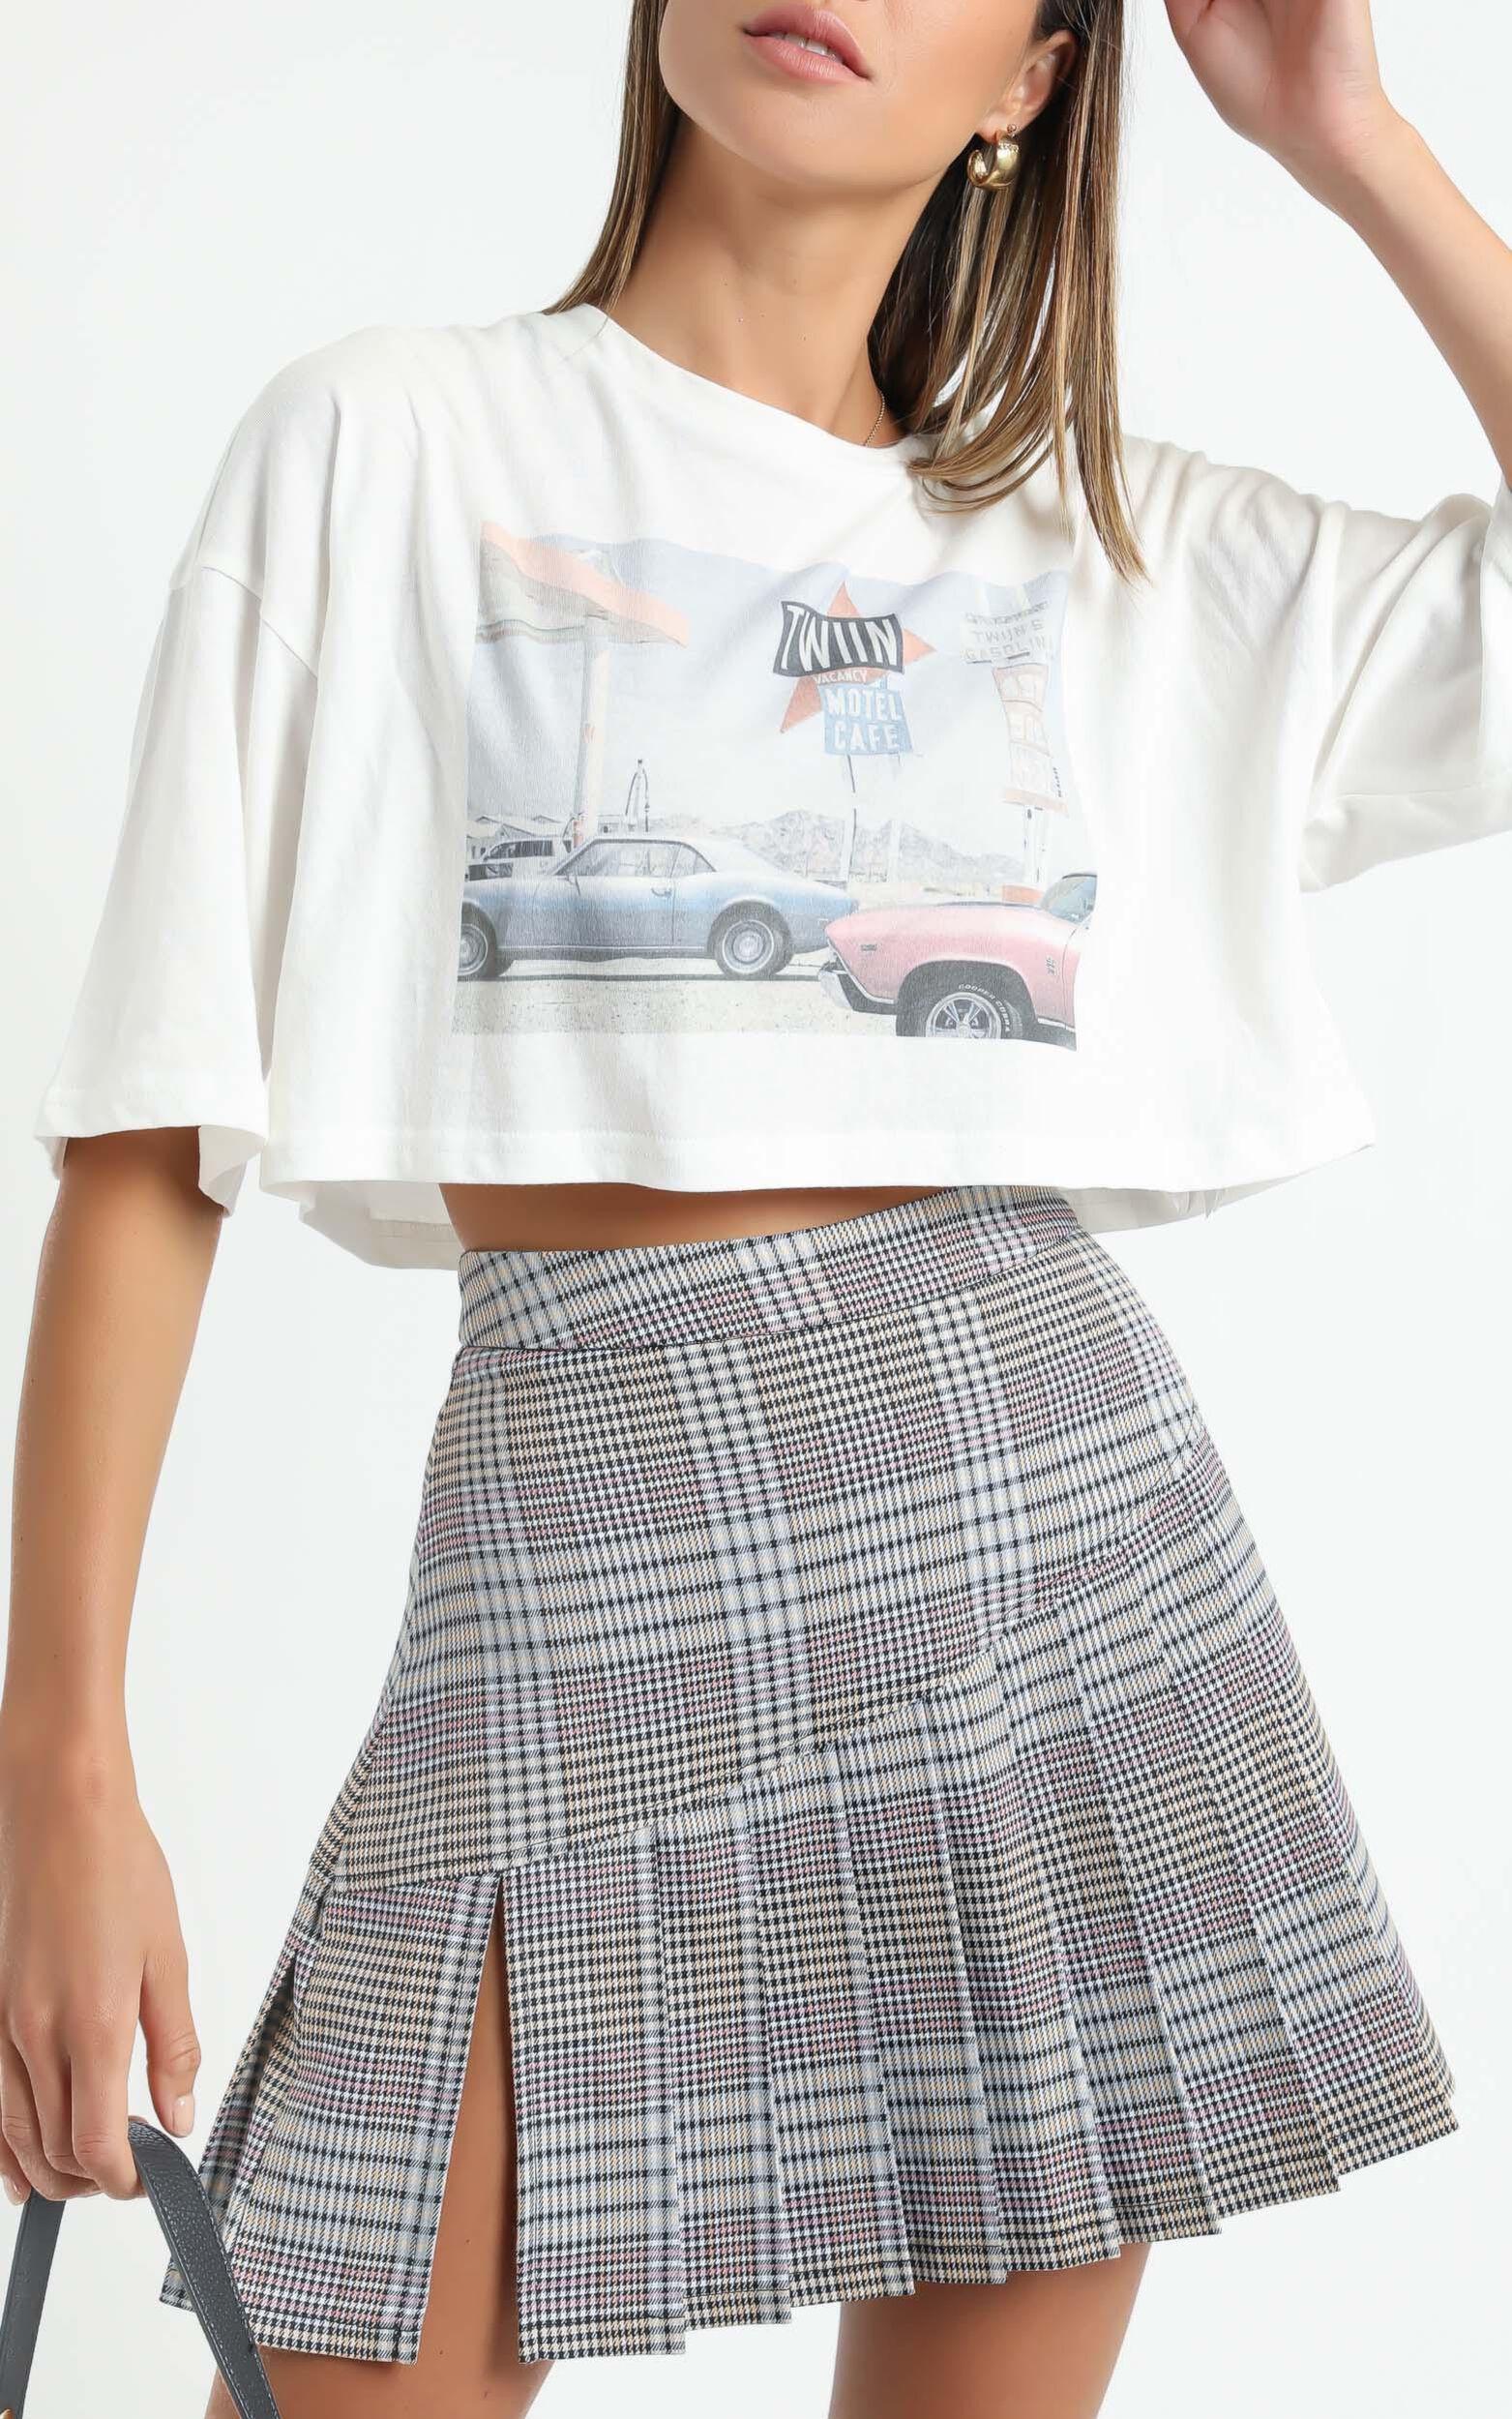 Twiin - Depict Mini Skirt in Multi - XS, Grey, super-hi-res image number null